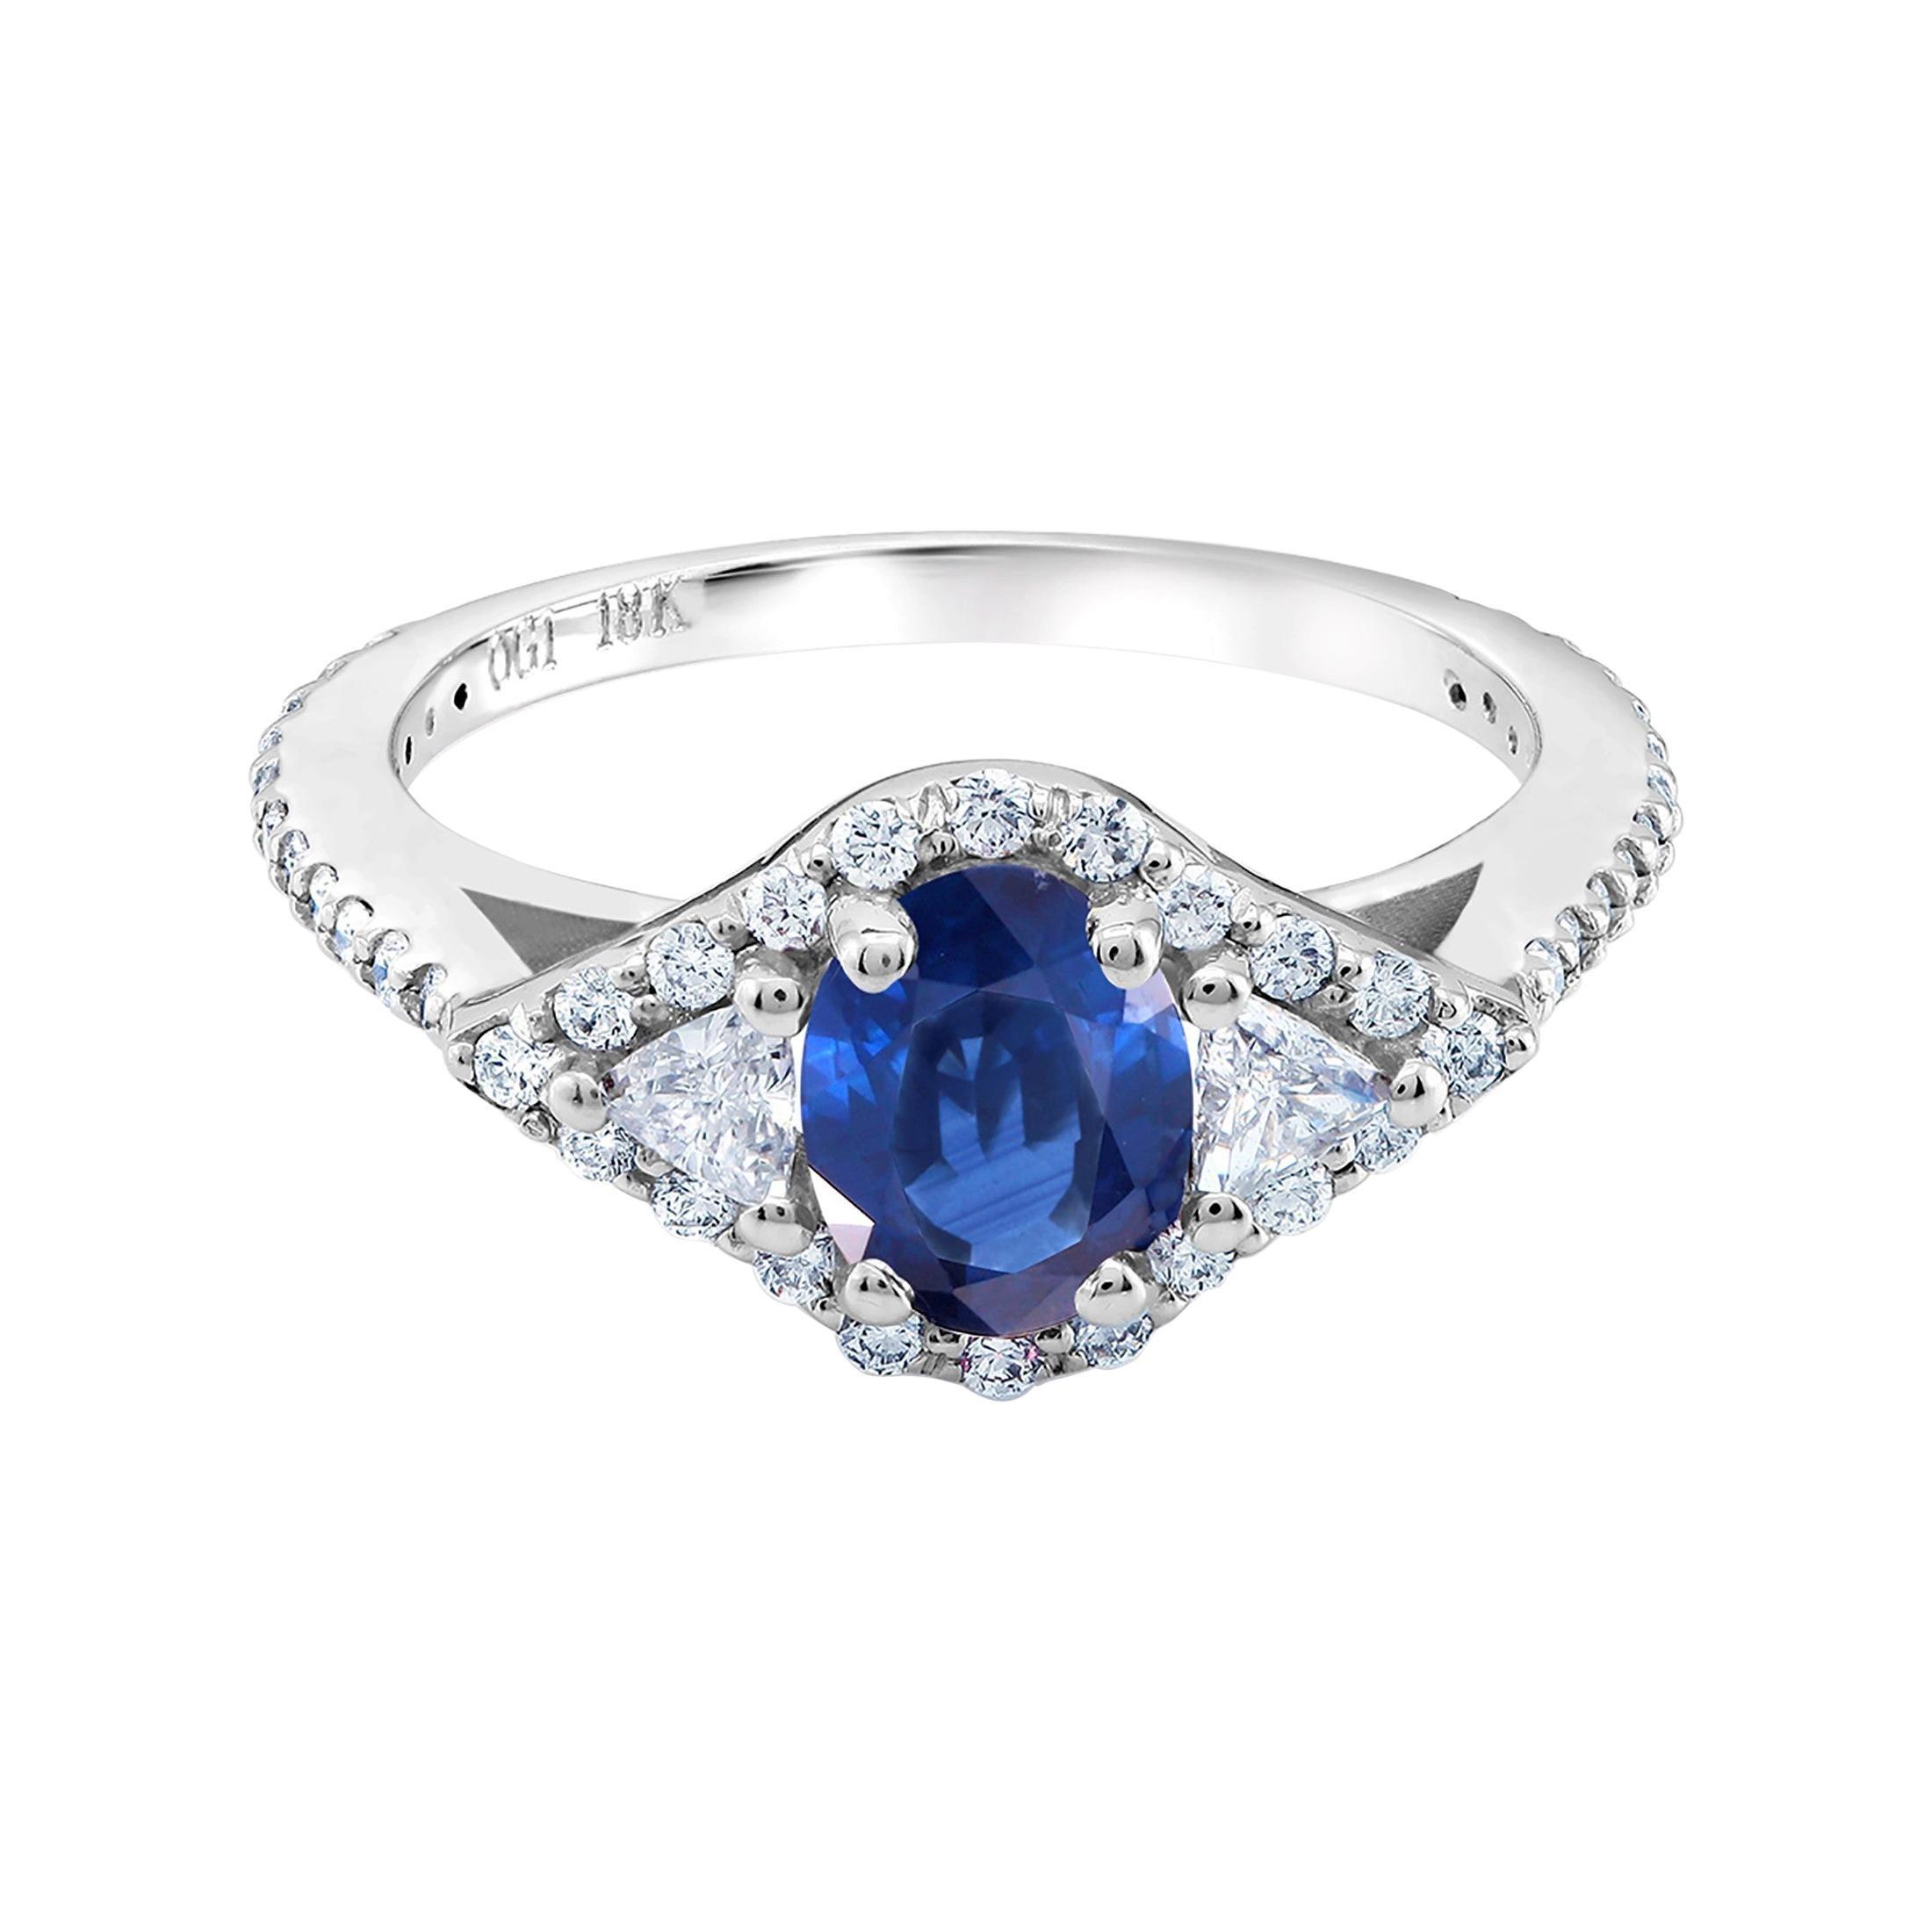 18 Karat White Gold Sapphire and Trillion Diamonds Cocktail Cluster Ring